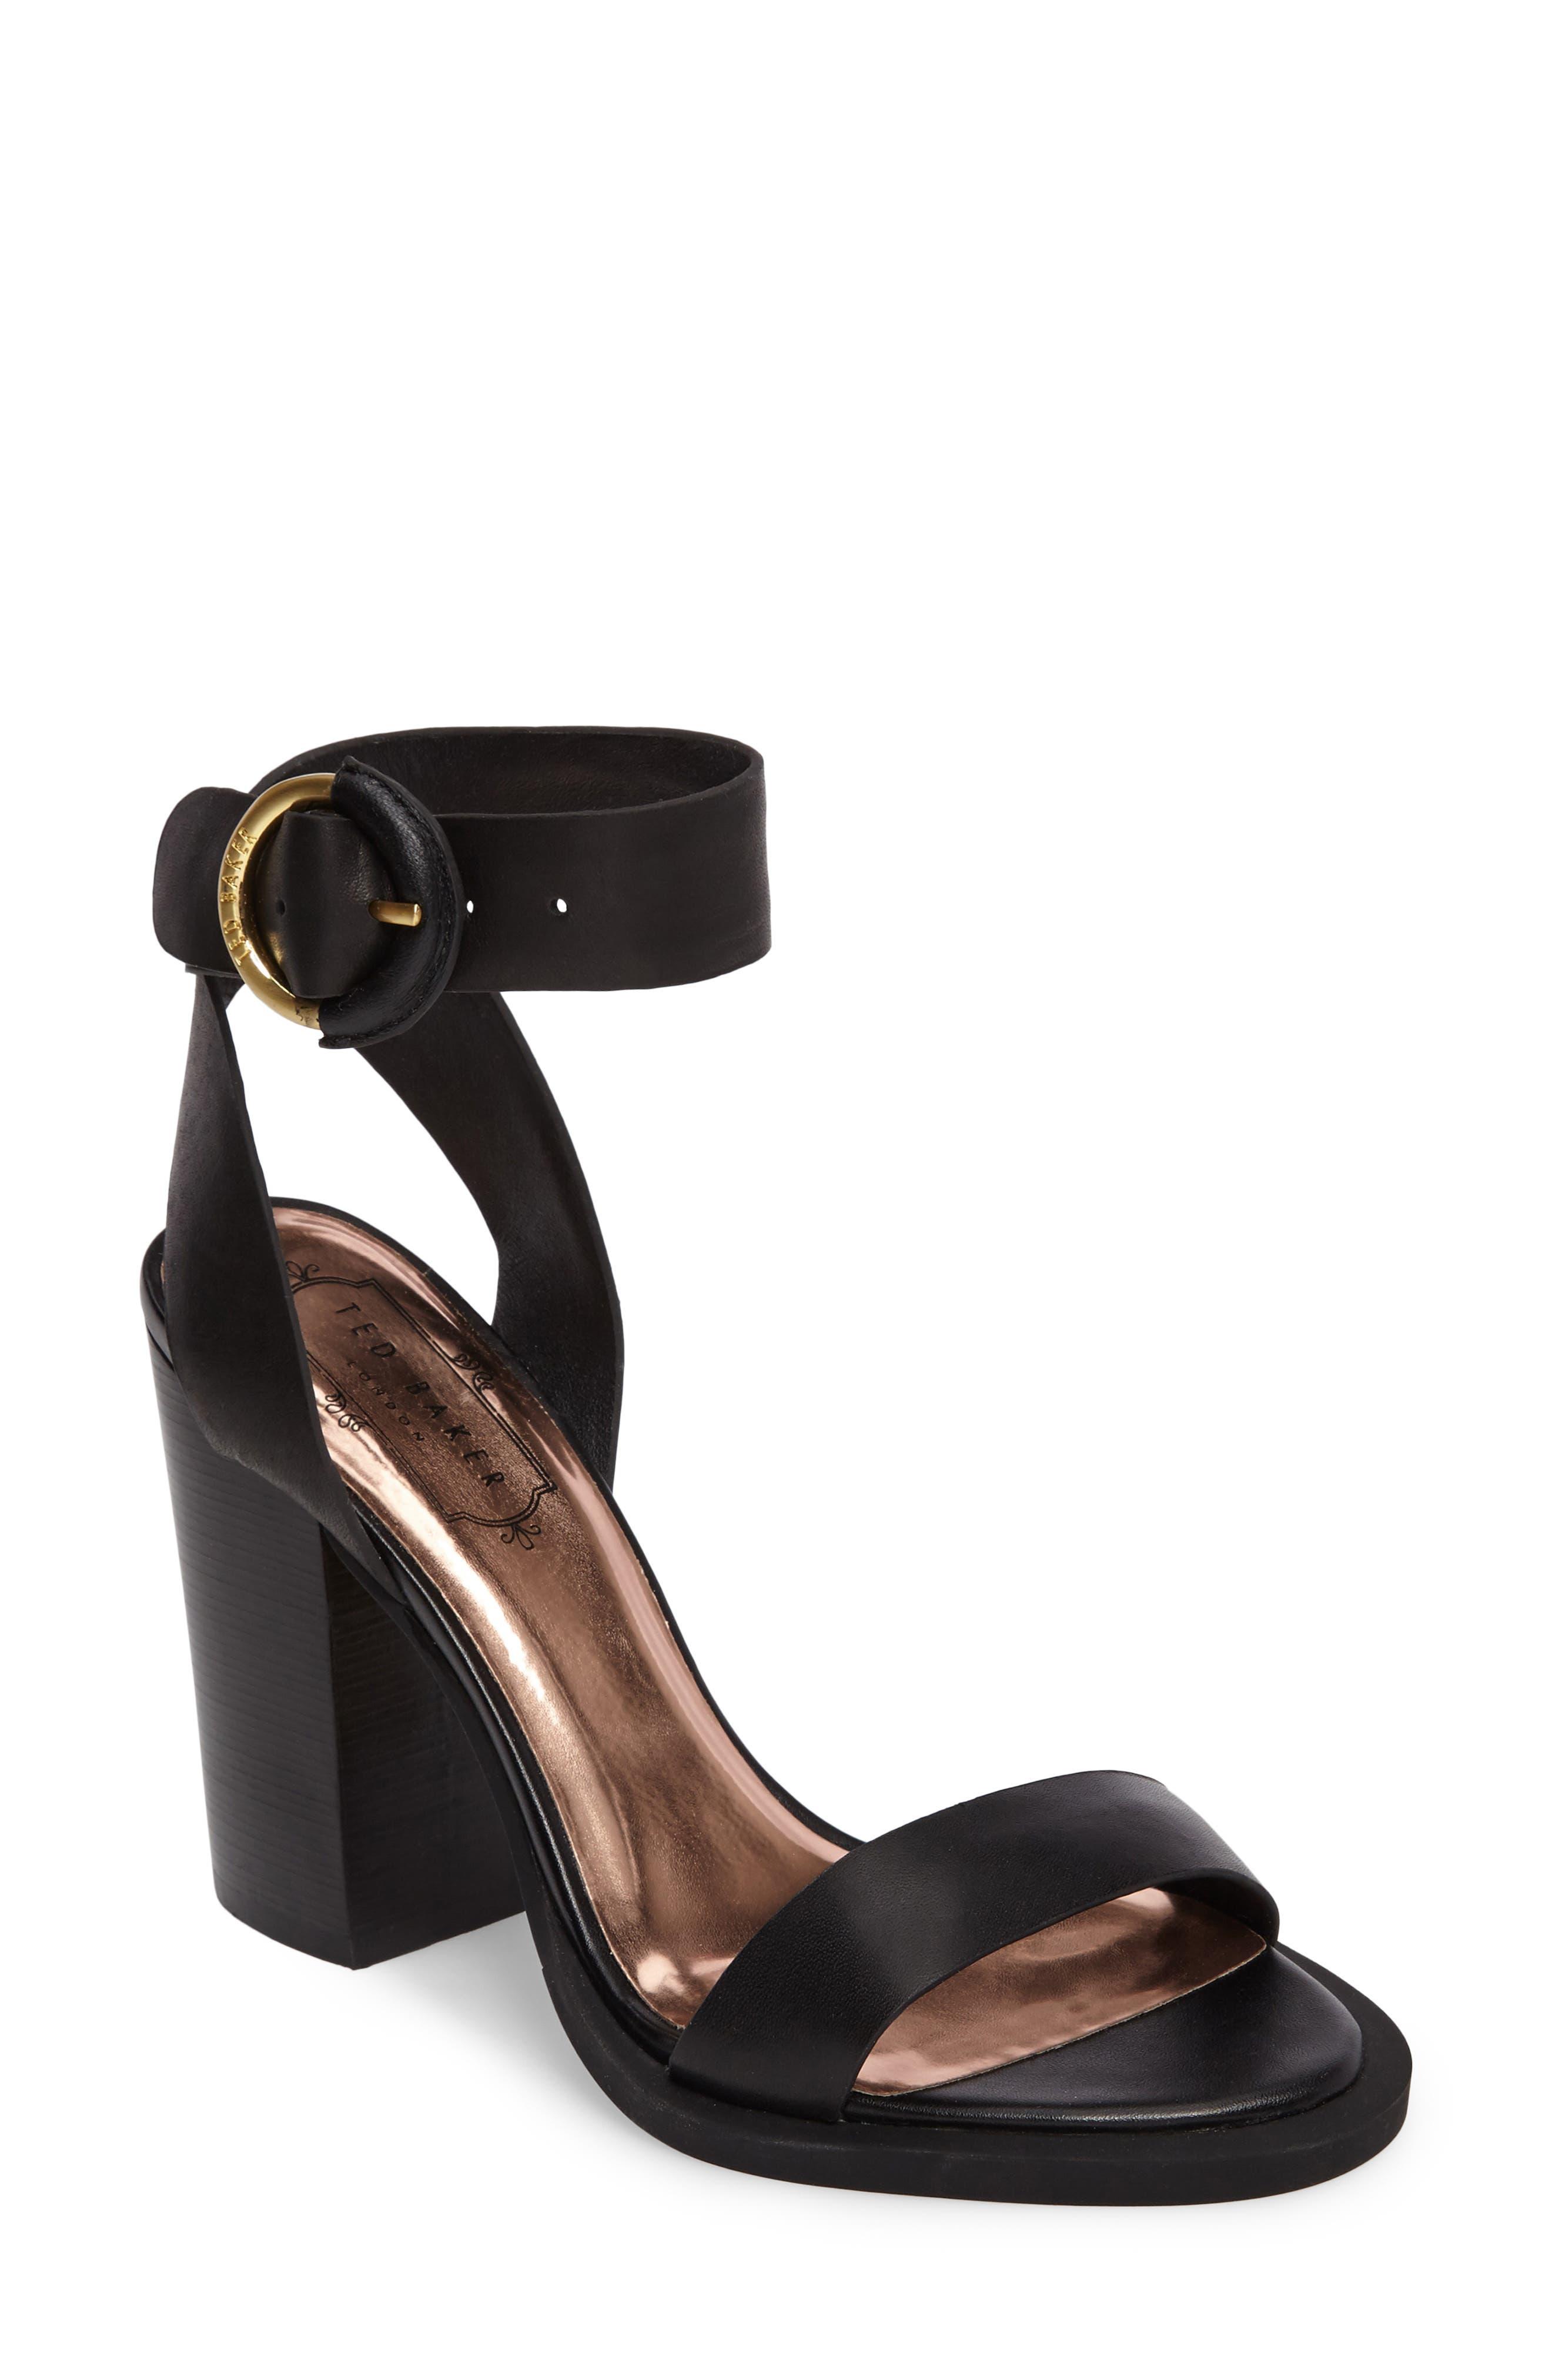 Betciy Ankle Strap Sandal,                             Main thumbnail 1, color,                             Black Leather